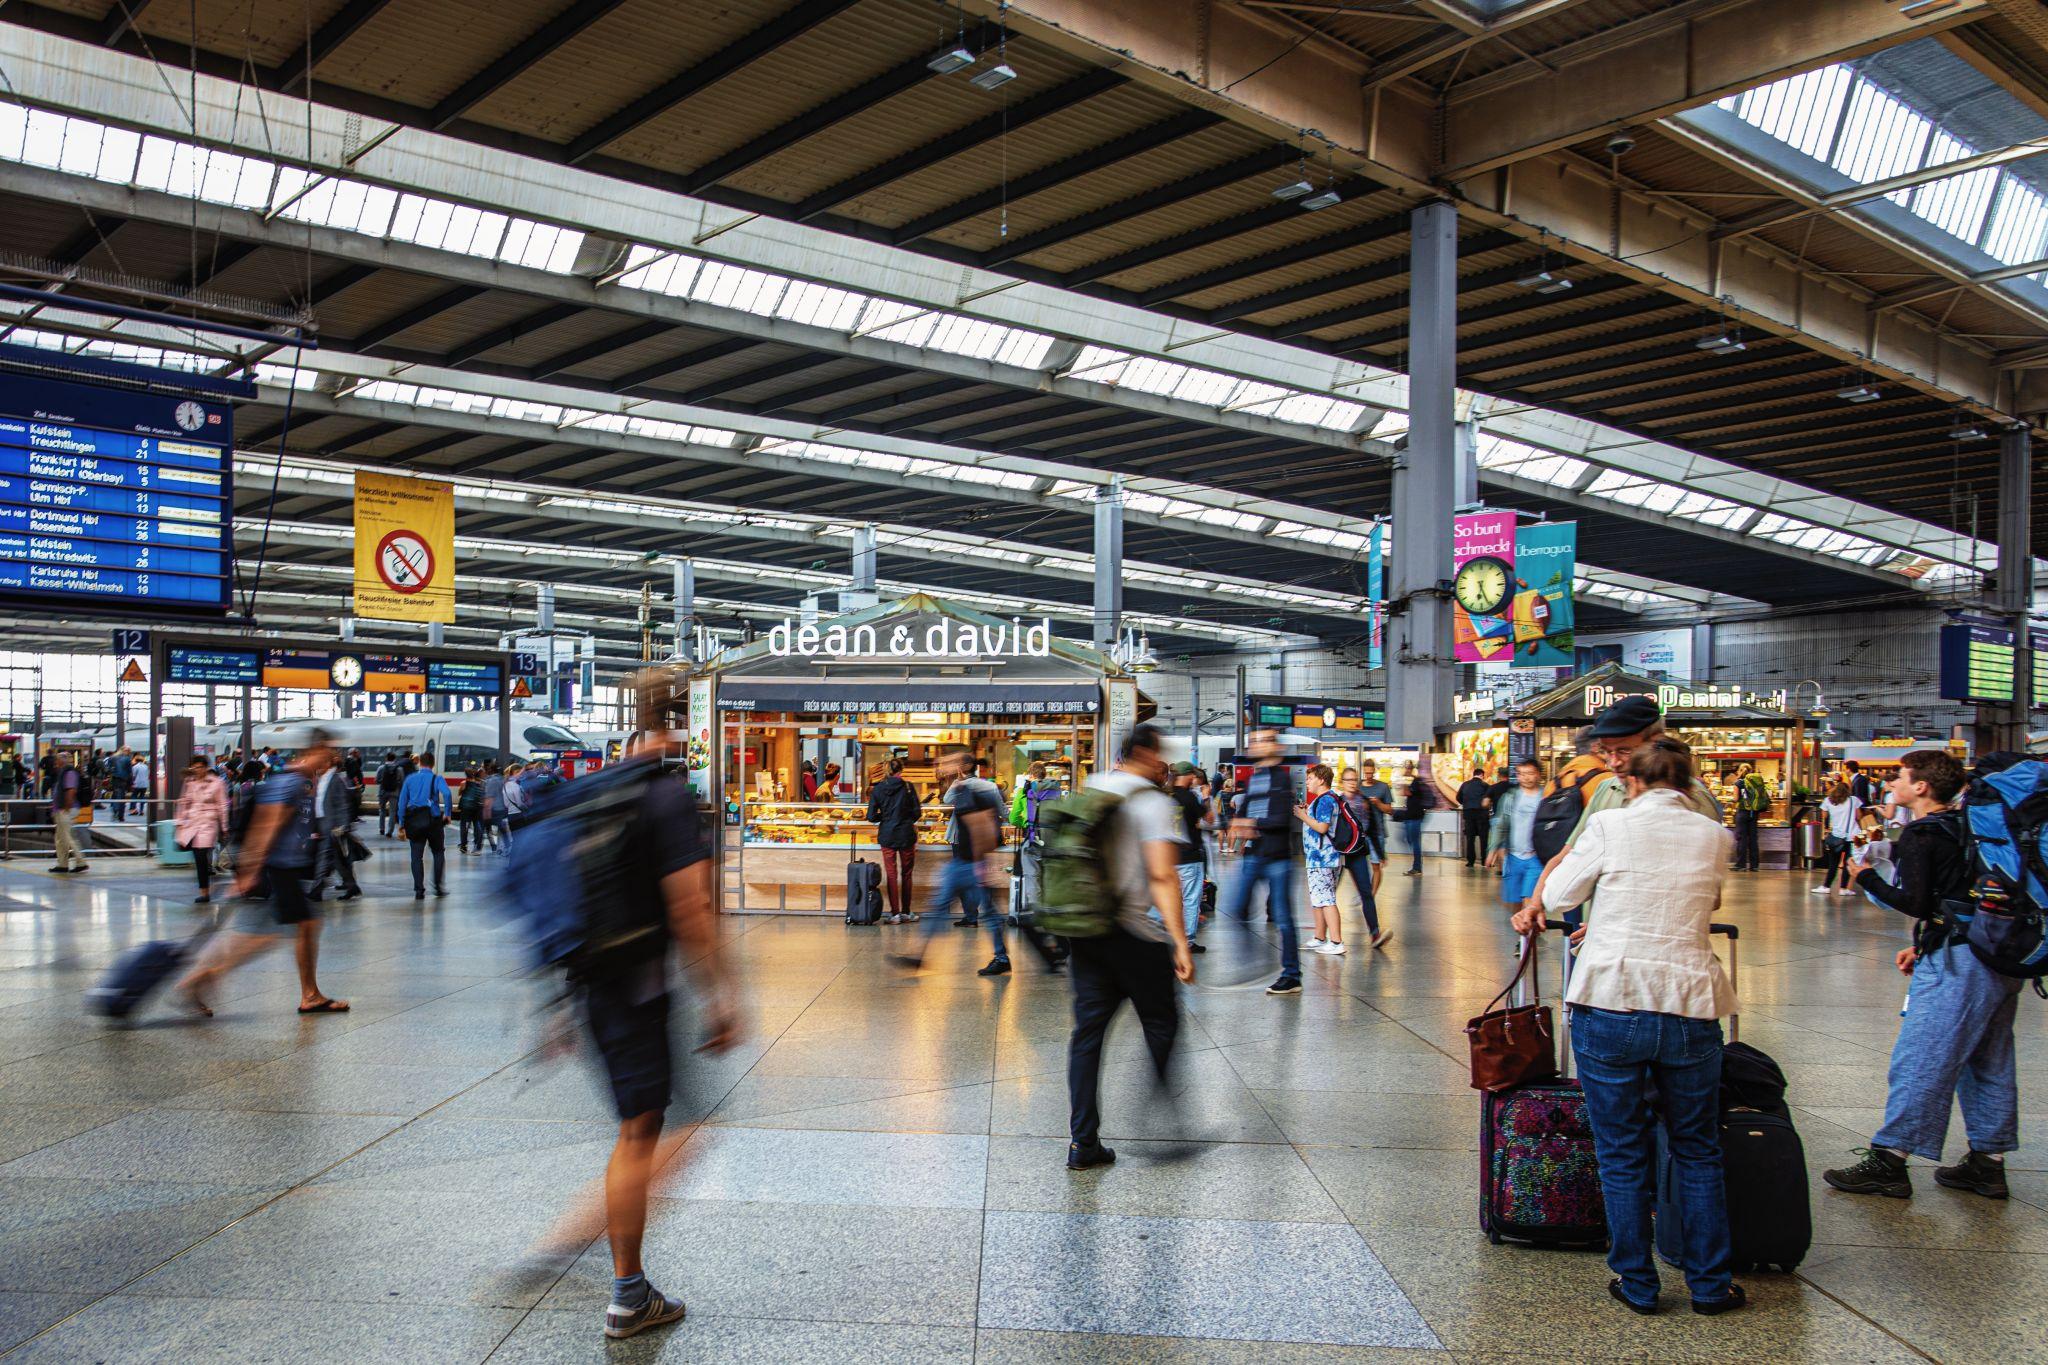 Munich Hof Hauptbahnhof, Germany